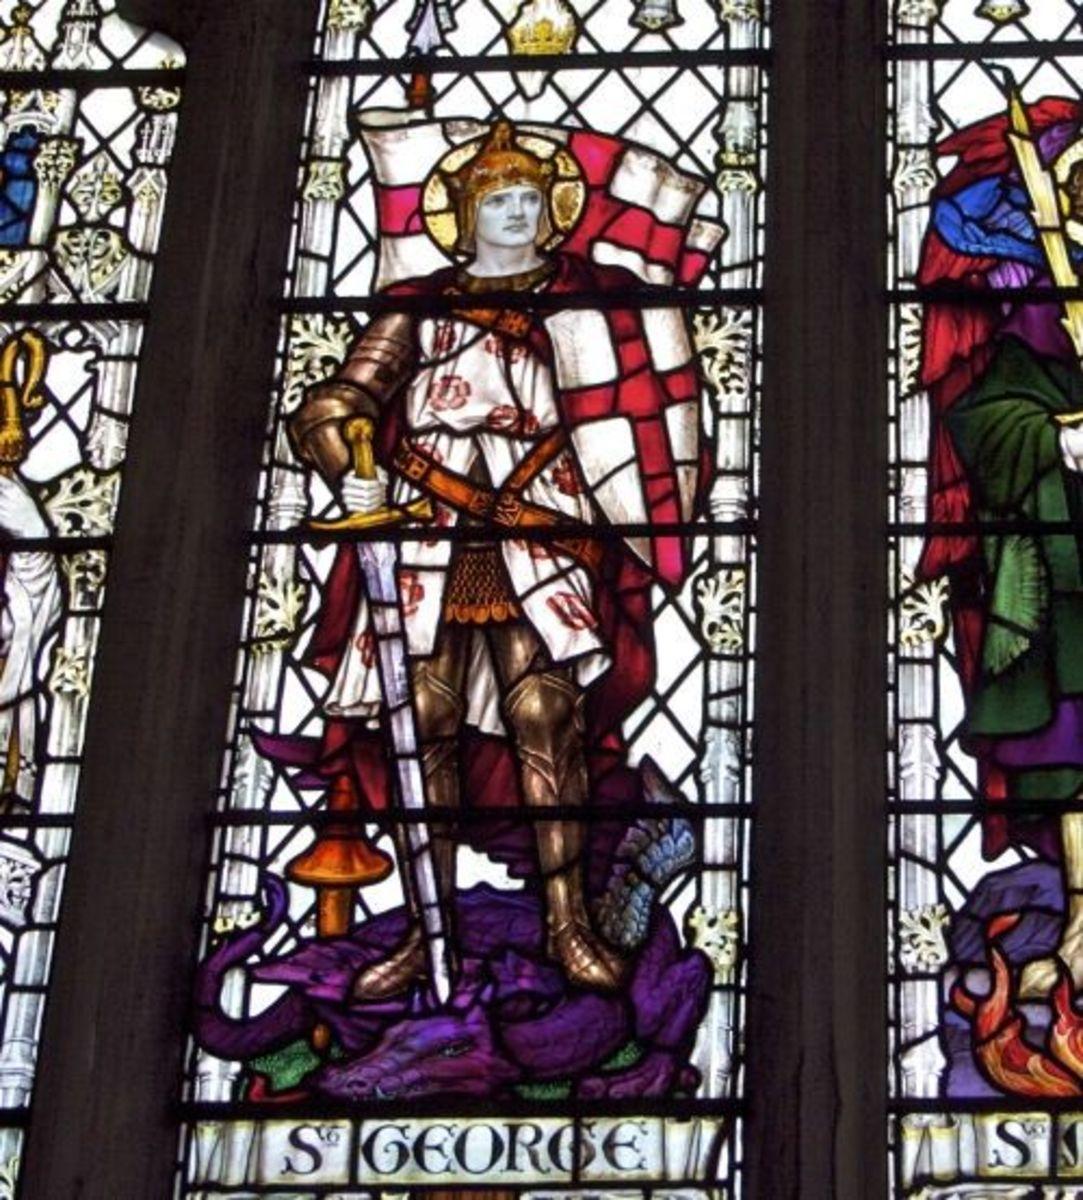 St George - Patron Saint Of England